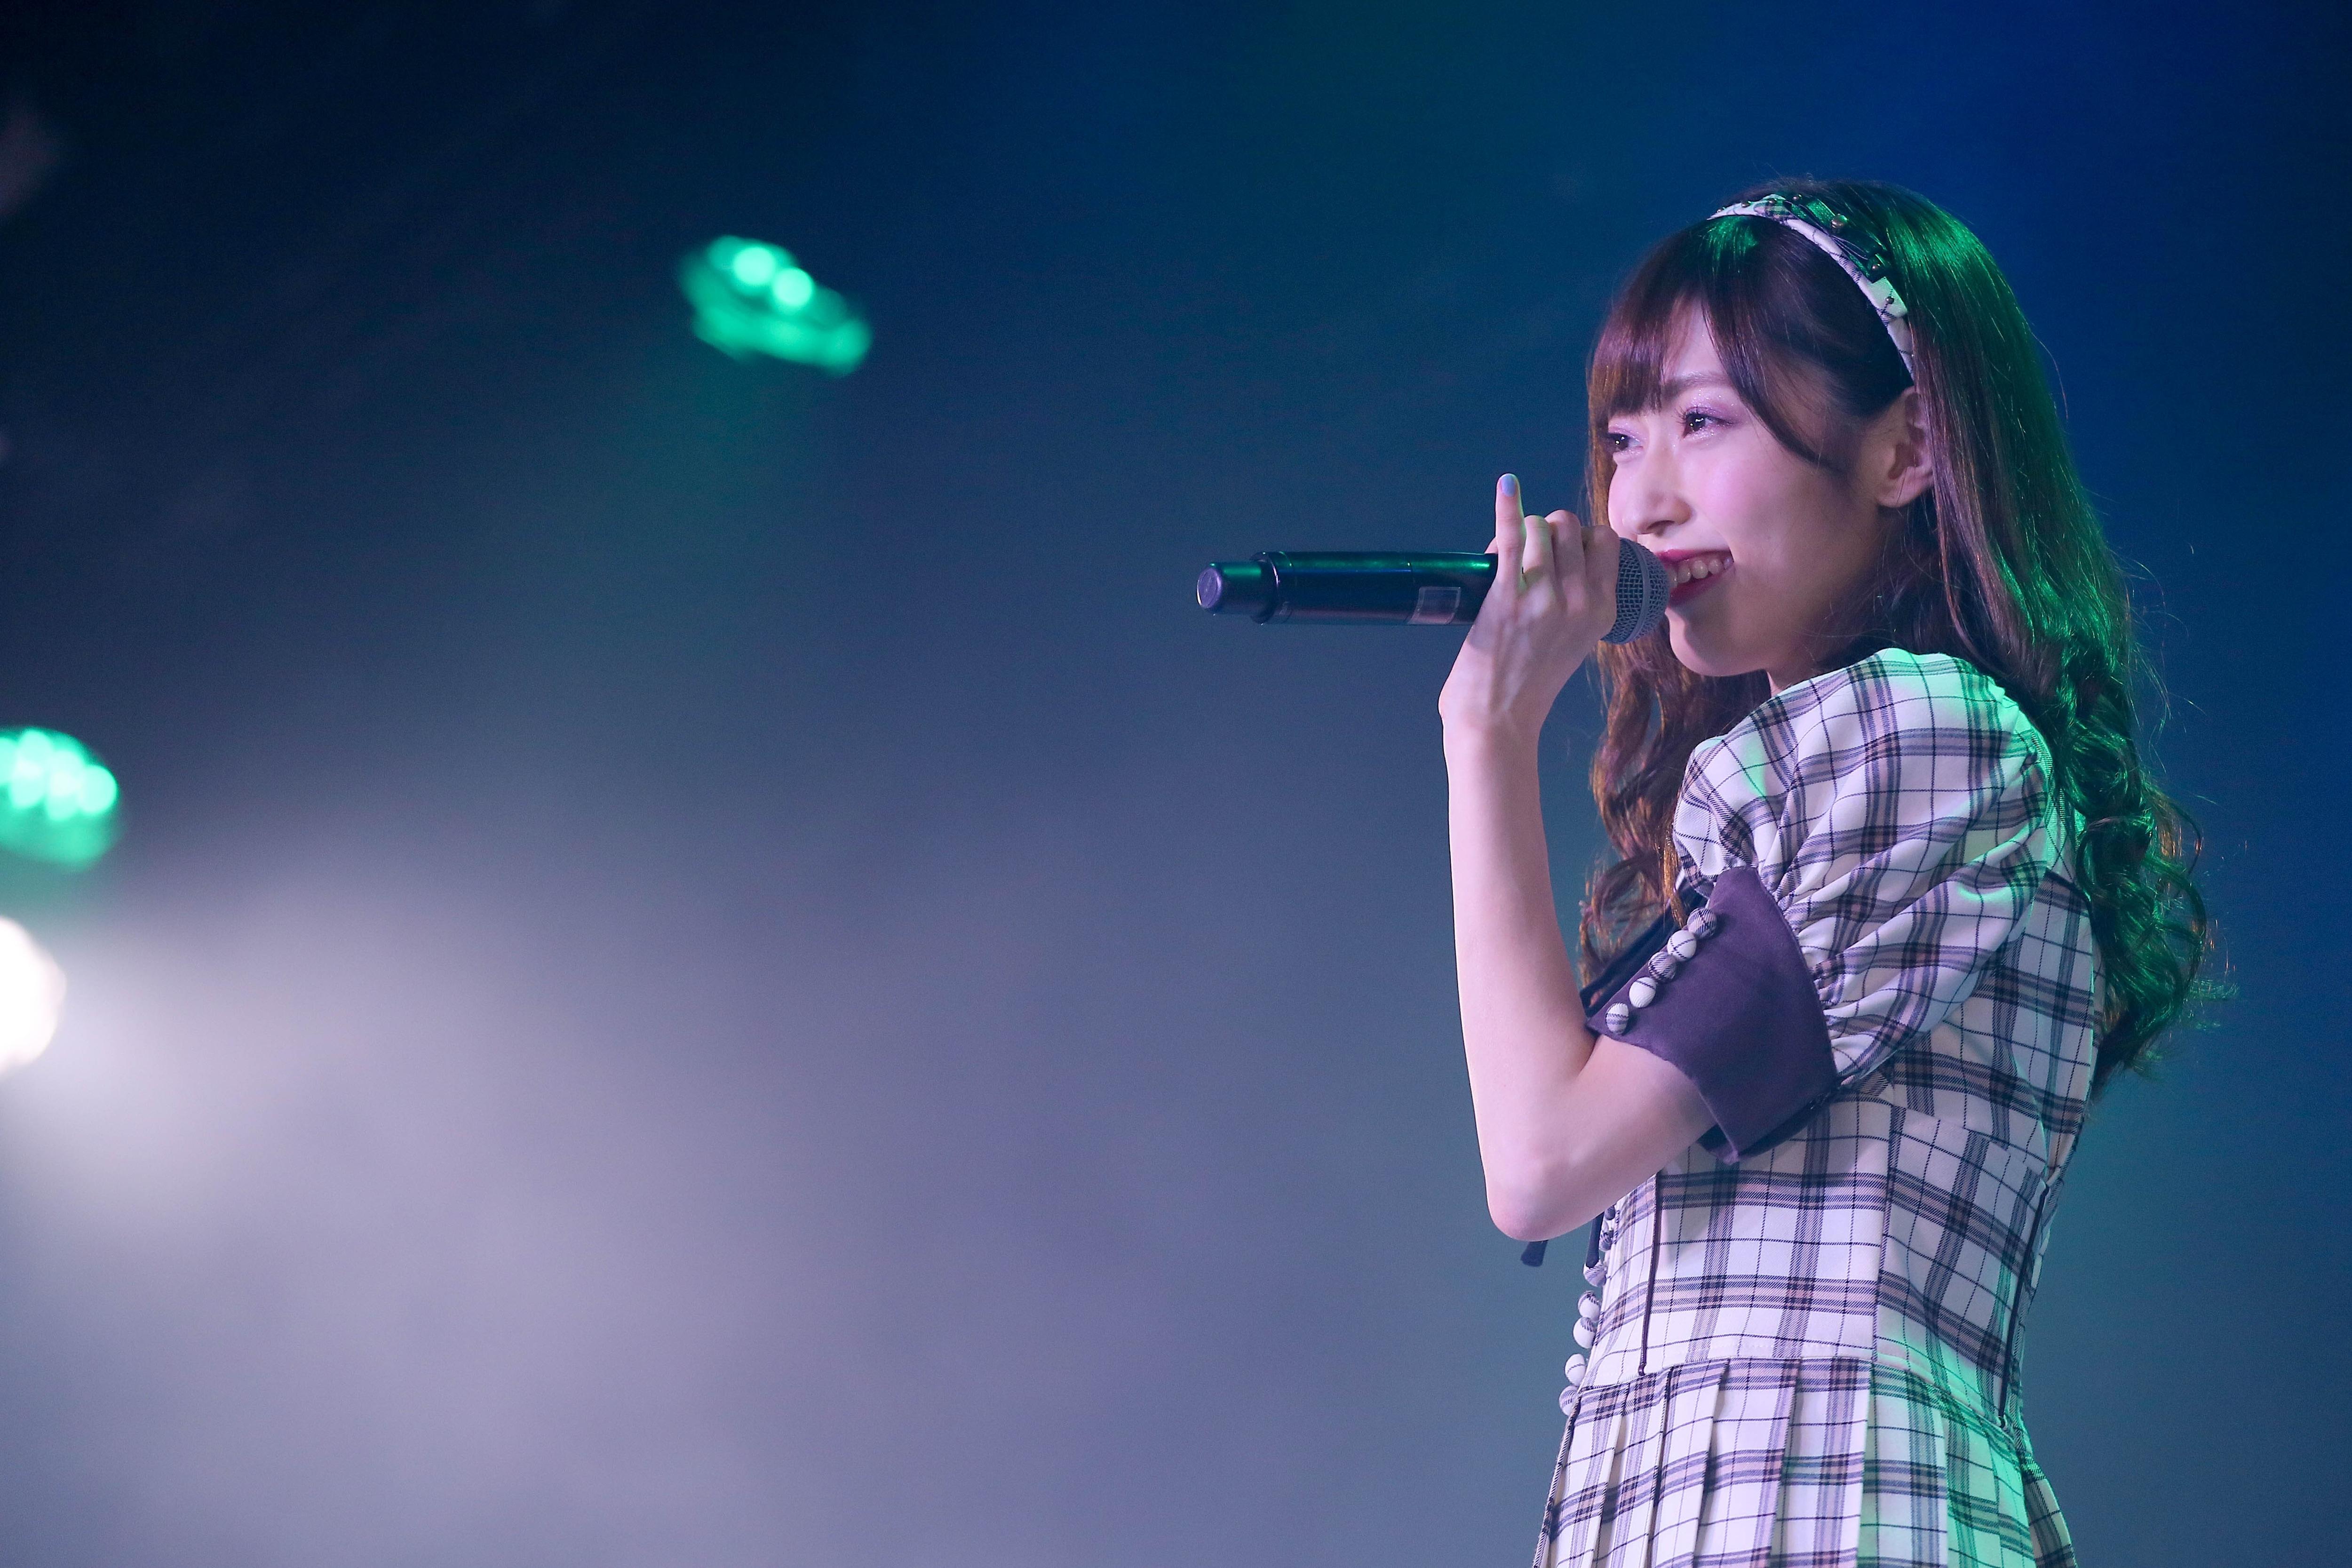 NGT48⼭⼝真帆、菅原りこ、⻑⾕川玲奈・卒業公演後のコメント発表!【写真14枚】の画像002